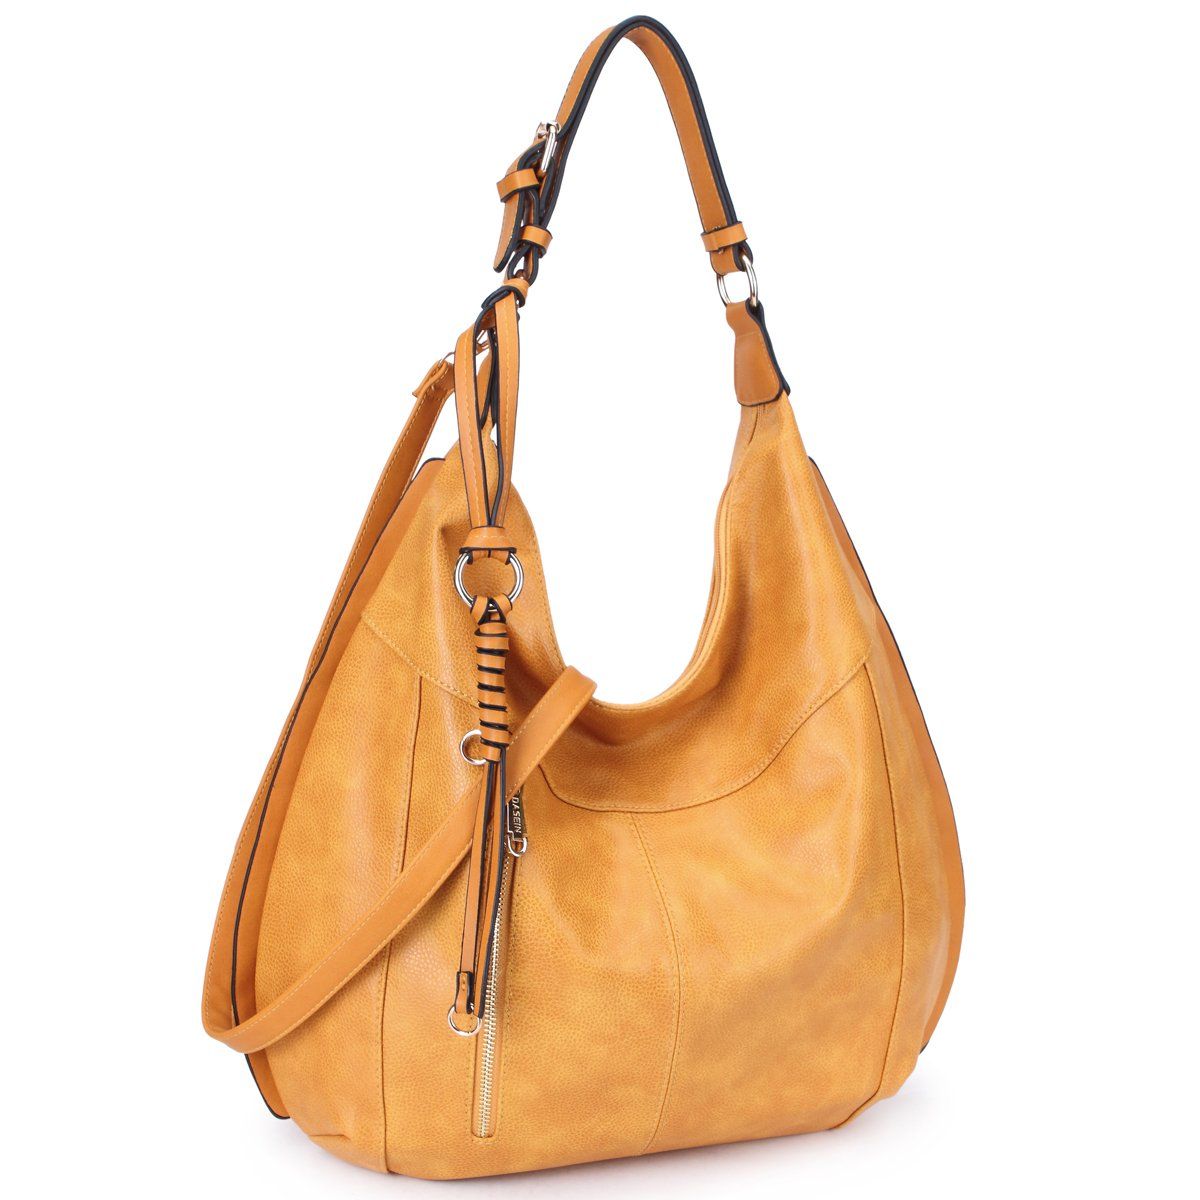 5821eade44 Dasein Womens Large Soft Hobo Bag Fashion Shoulder Bag Deisgner Purse  (Brown-1)  Amazon.ca  Shoes   Handbags